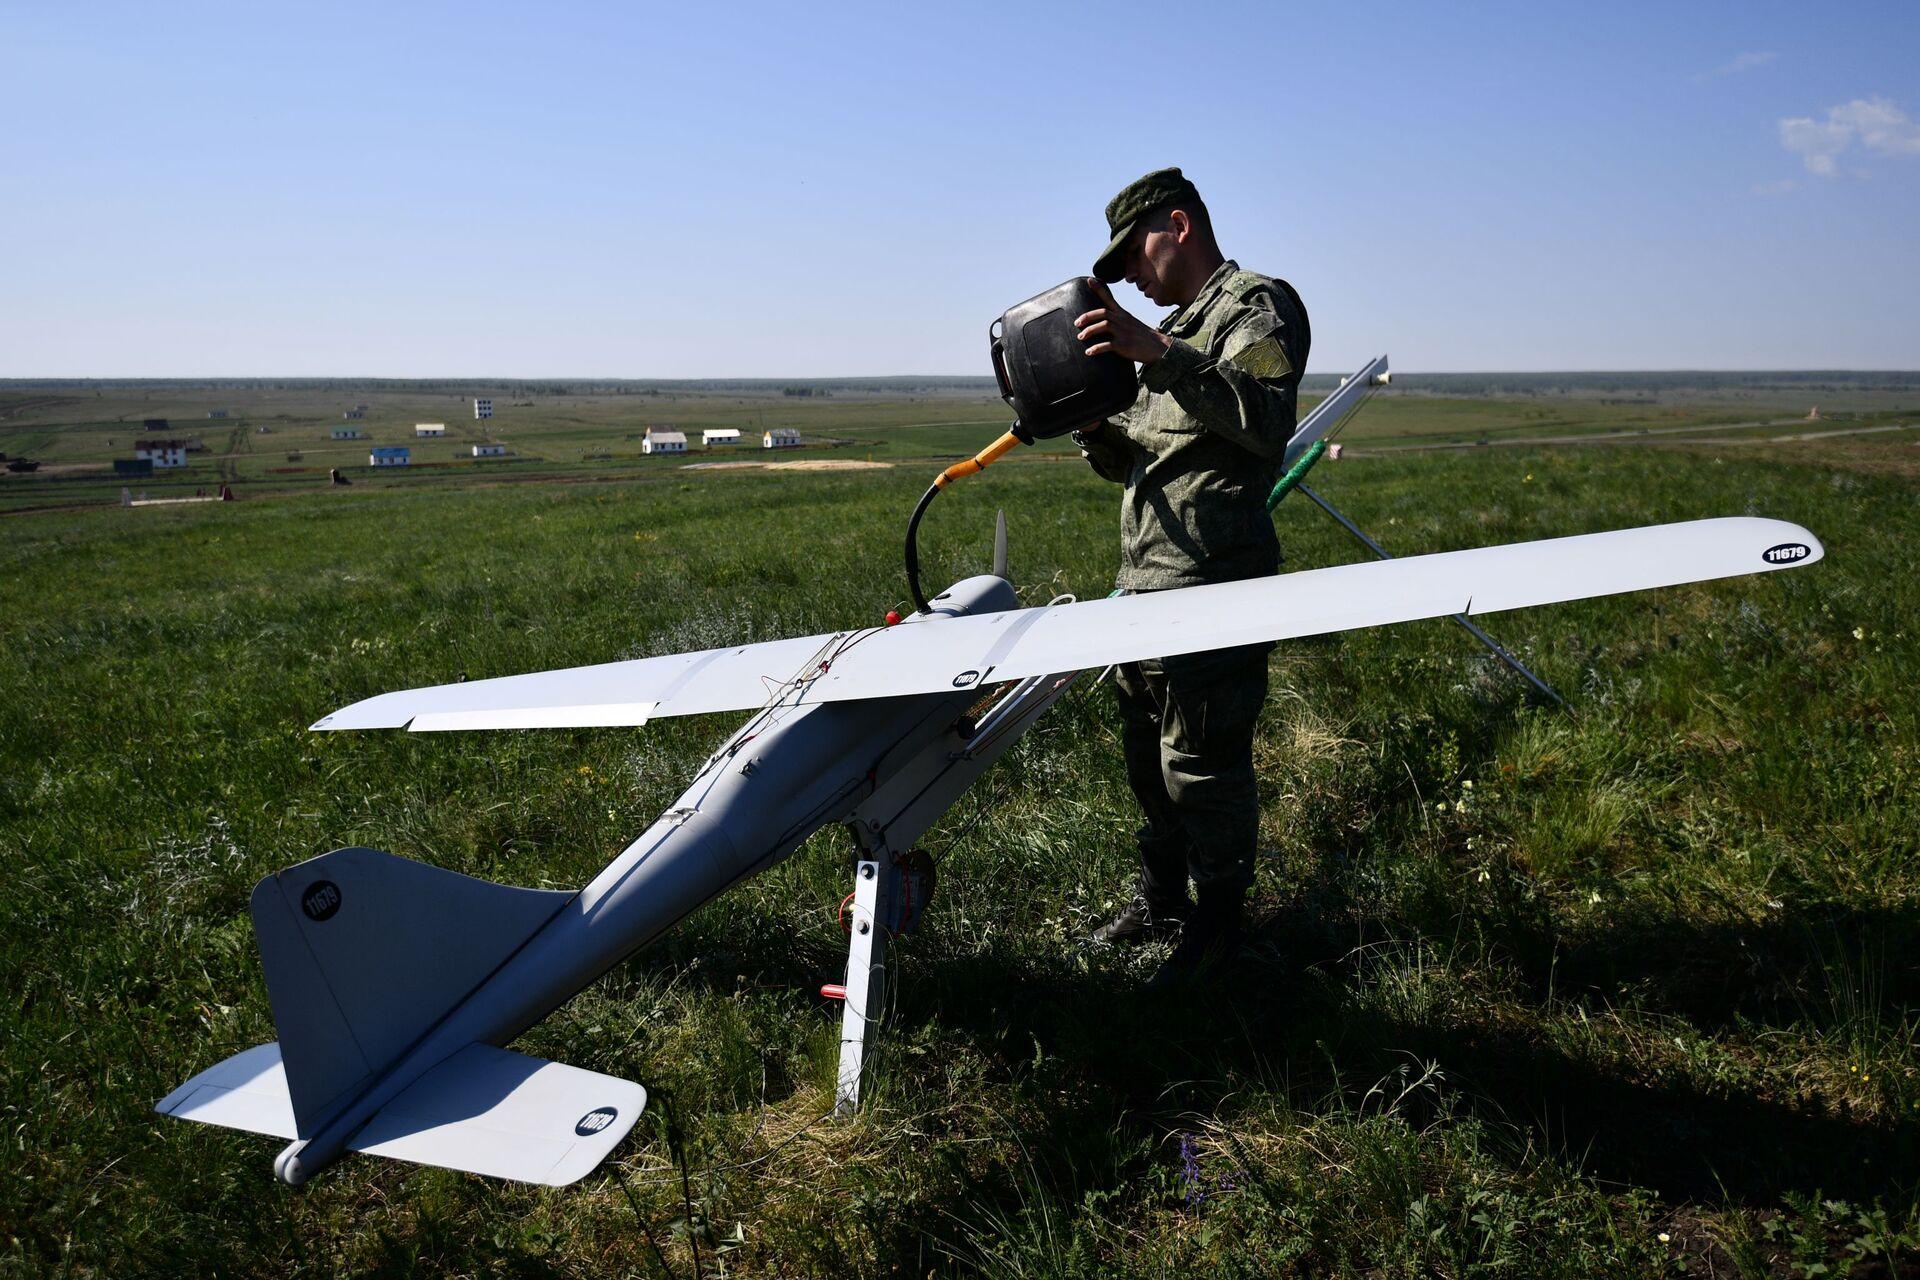 An Orlan-10 surveillance drone at a firing range in Chelyabinsk region, Russia. - Sputnik International, 1920, 07.09.2021